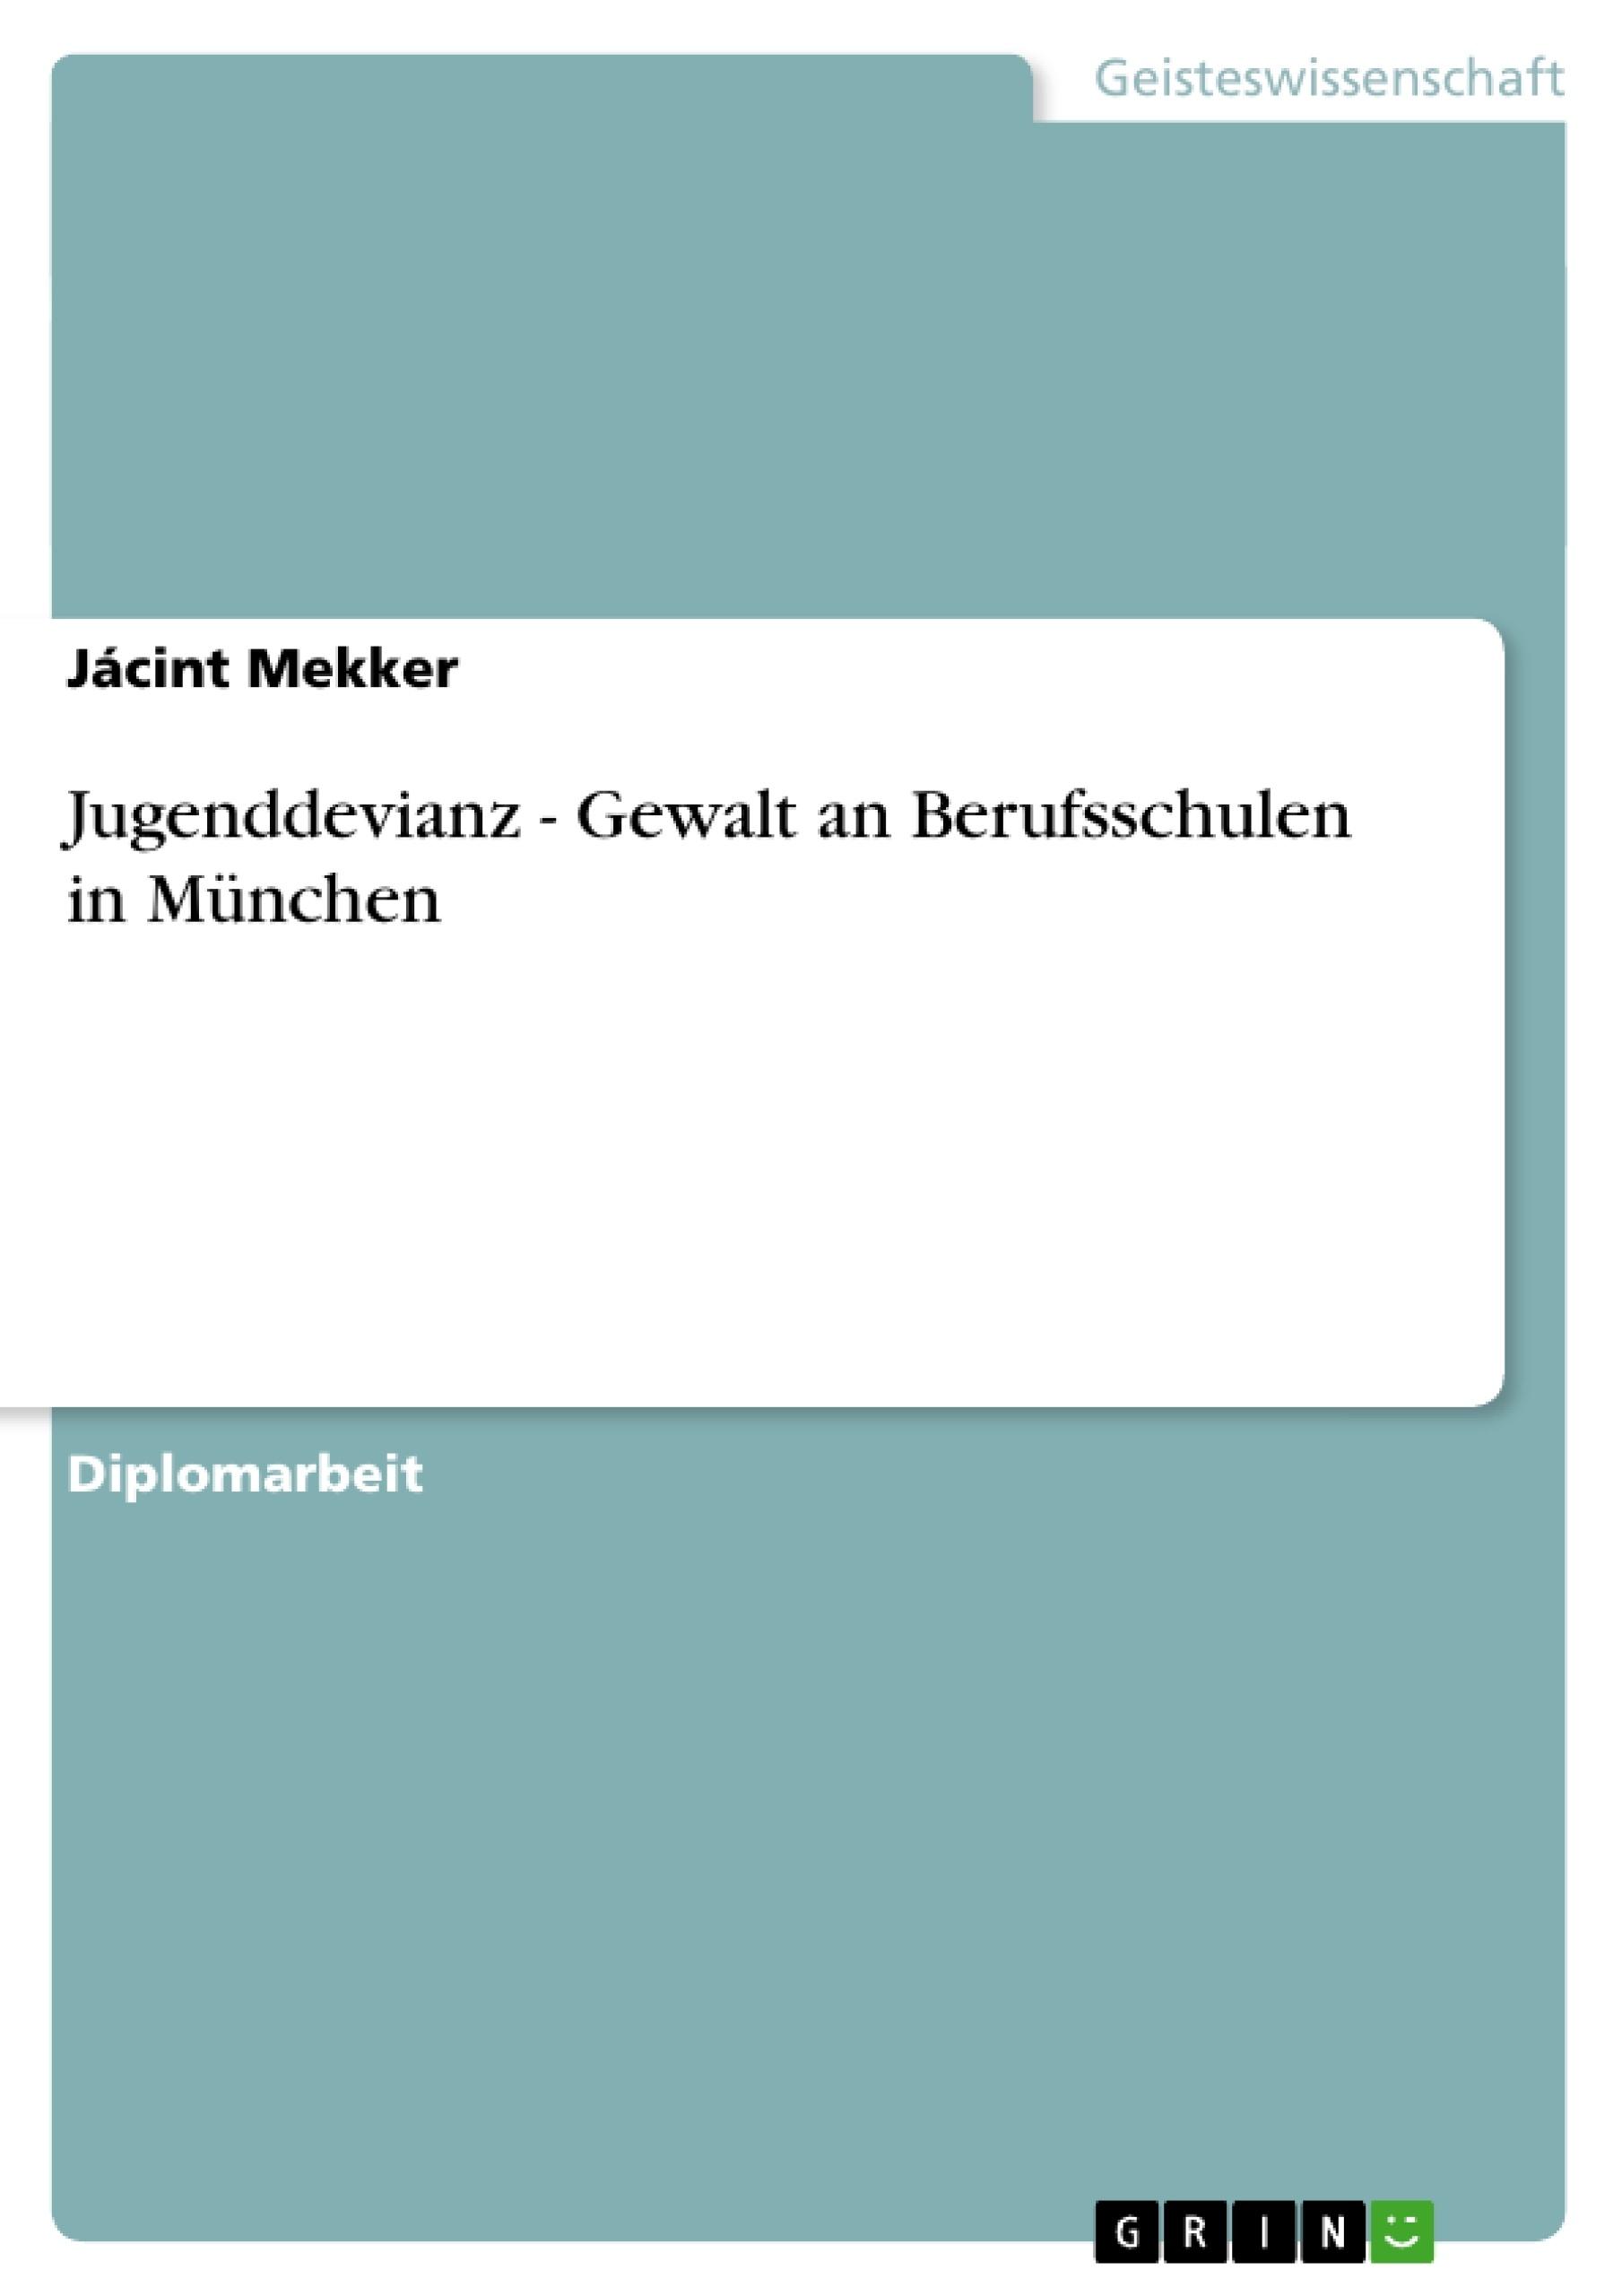 Titel: Jugenddevianz - Gewalt an Berufsschulen in München